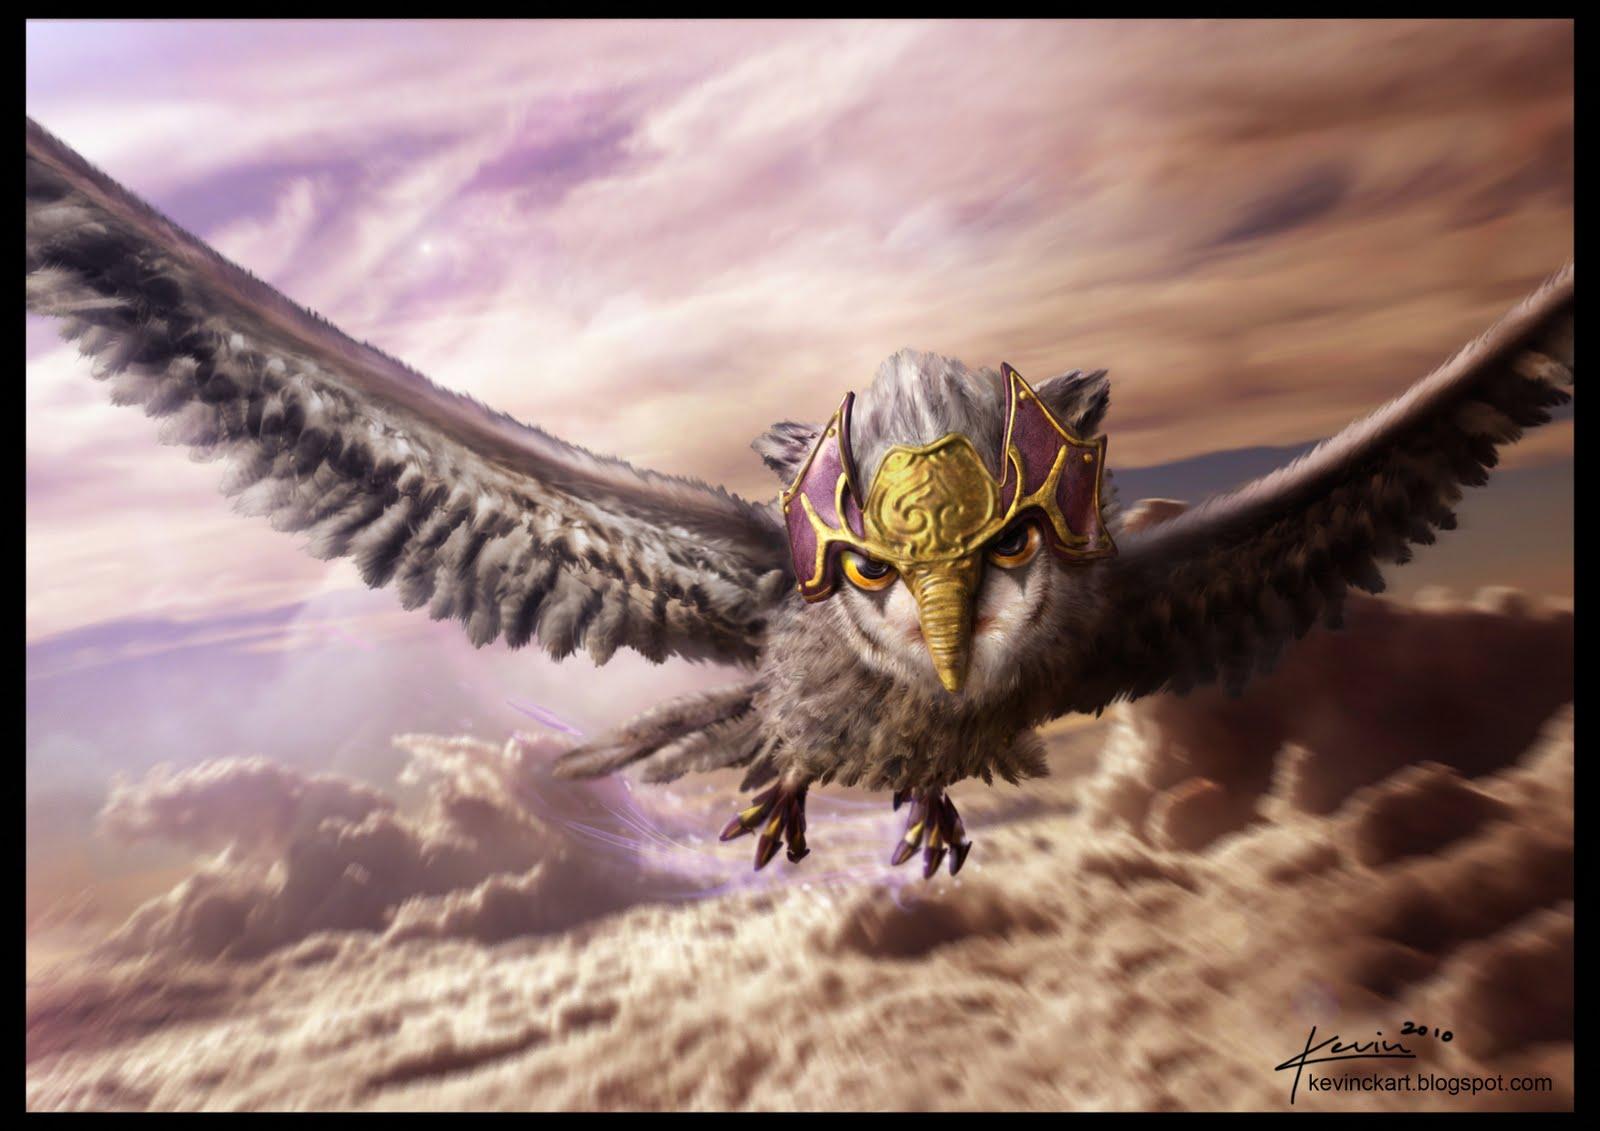 Movie - Legend Of The Guardians: The Owls Of Ga'Hoole  Bird Owl Wallpaper